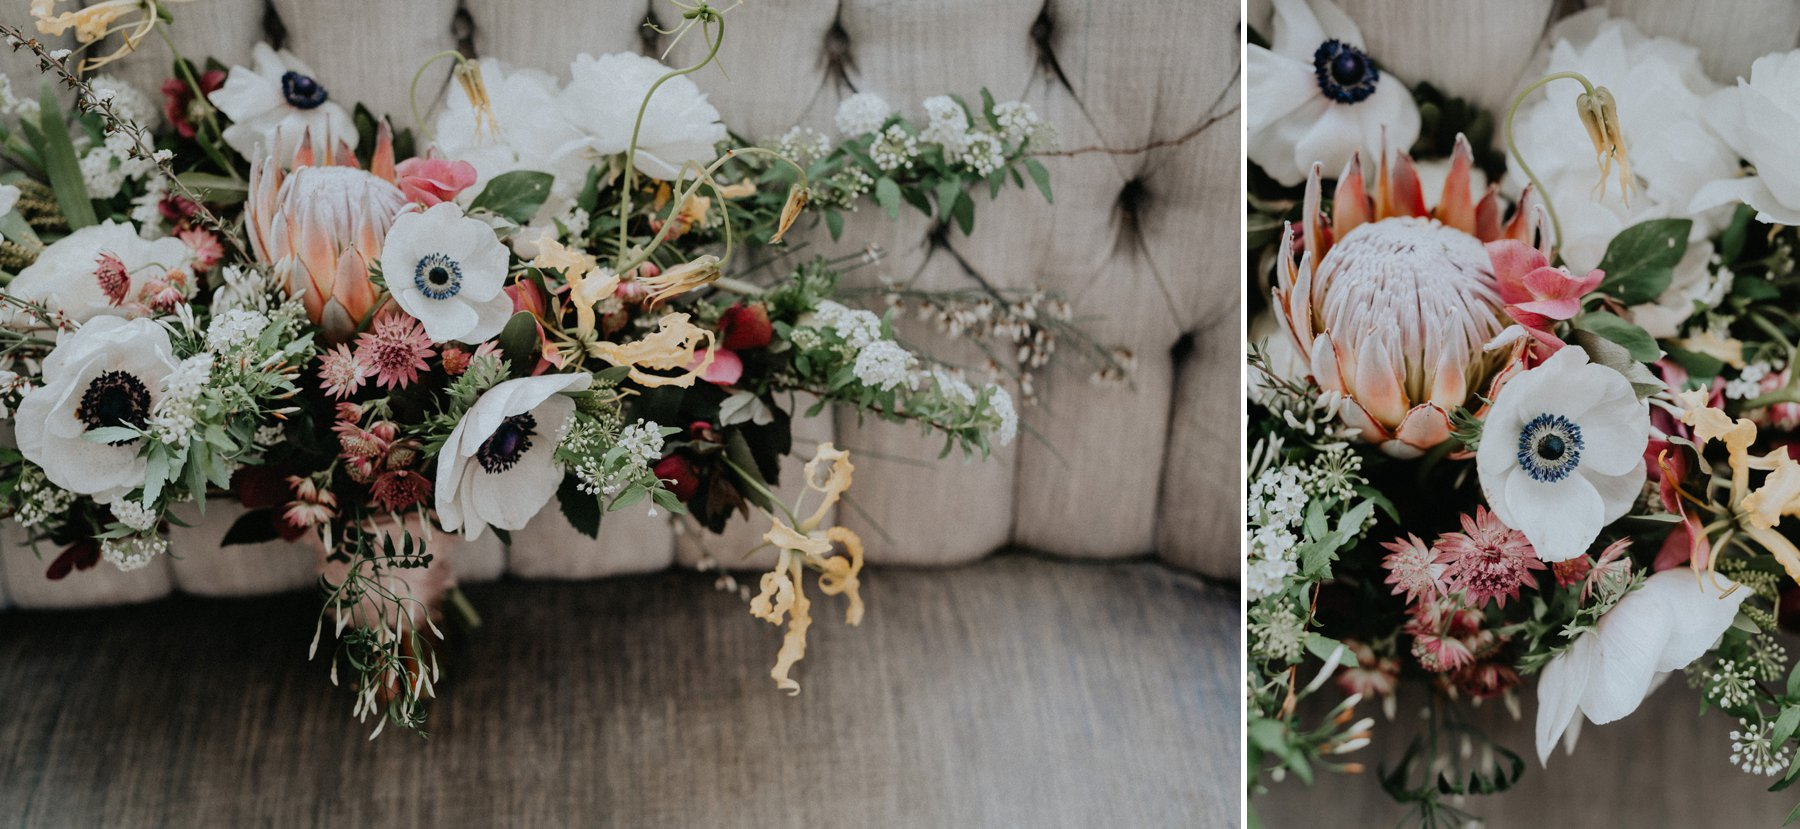 greenhouse-botanical-wedding-7.jpg